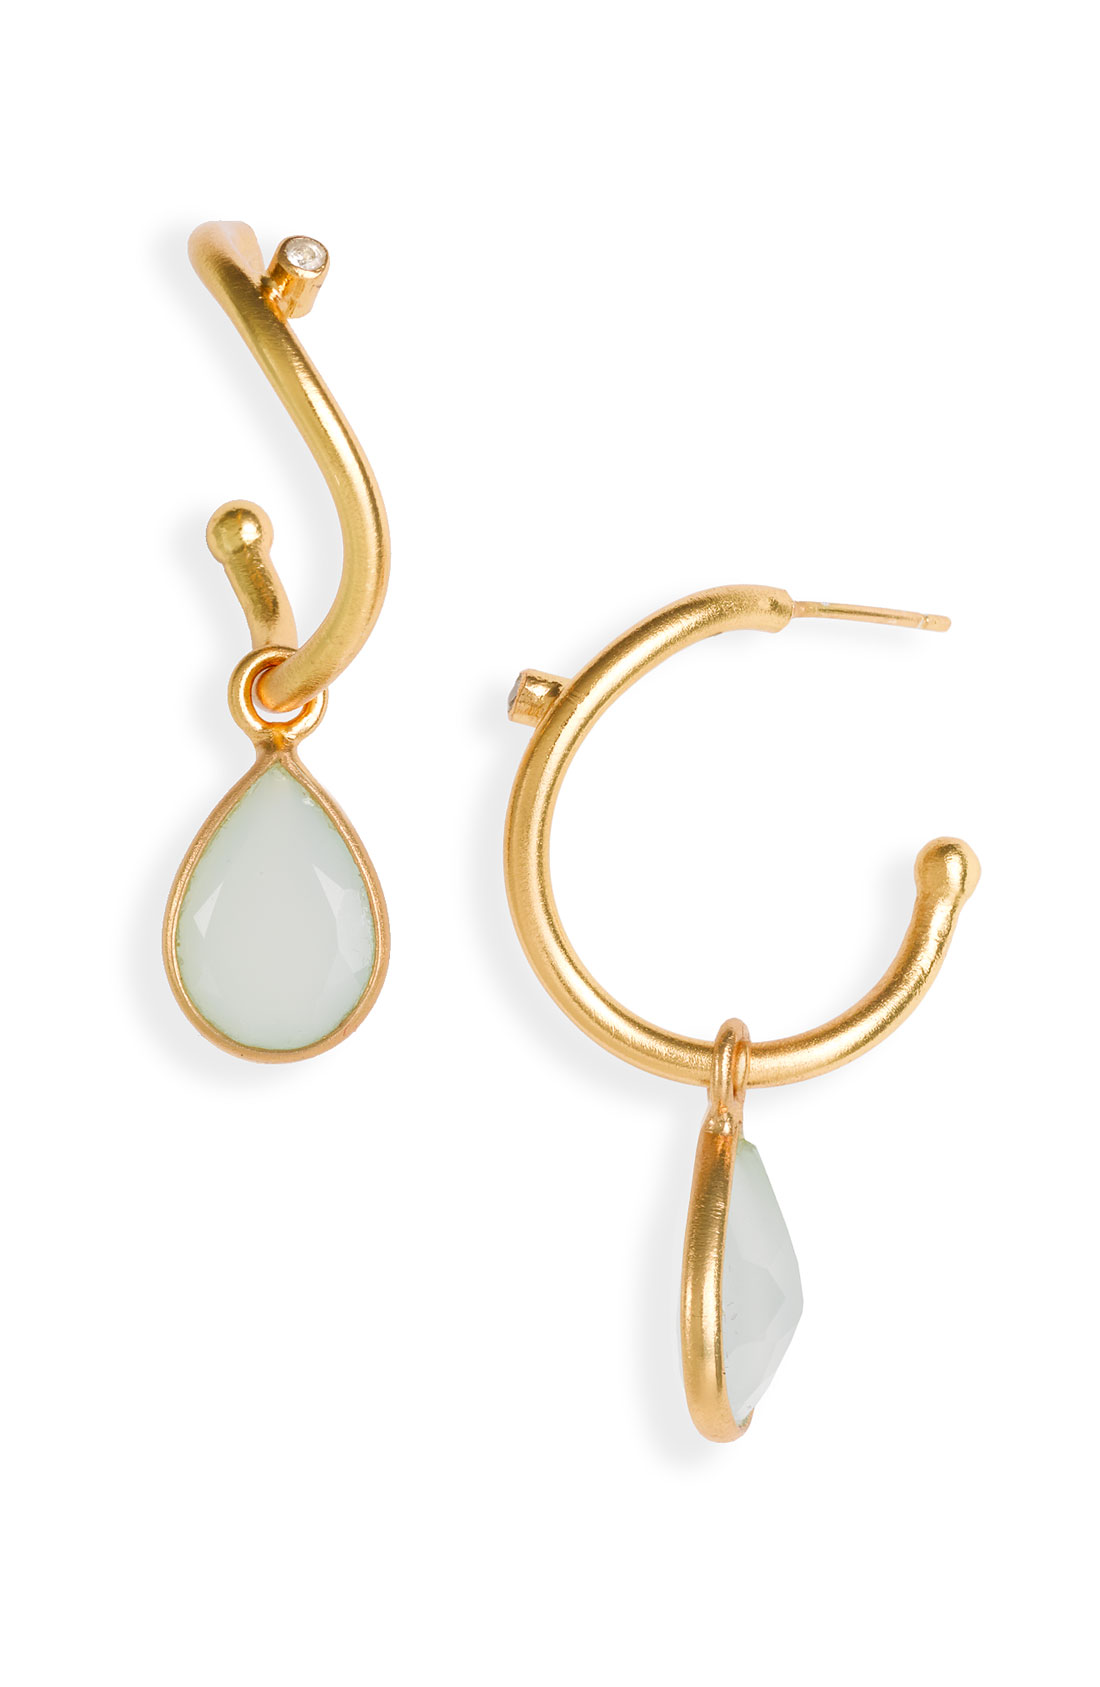 nunu designs small semiprecious drop hoop earrings in gold